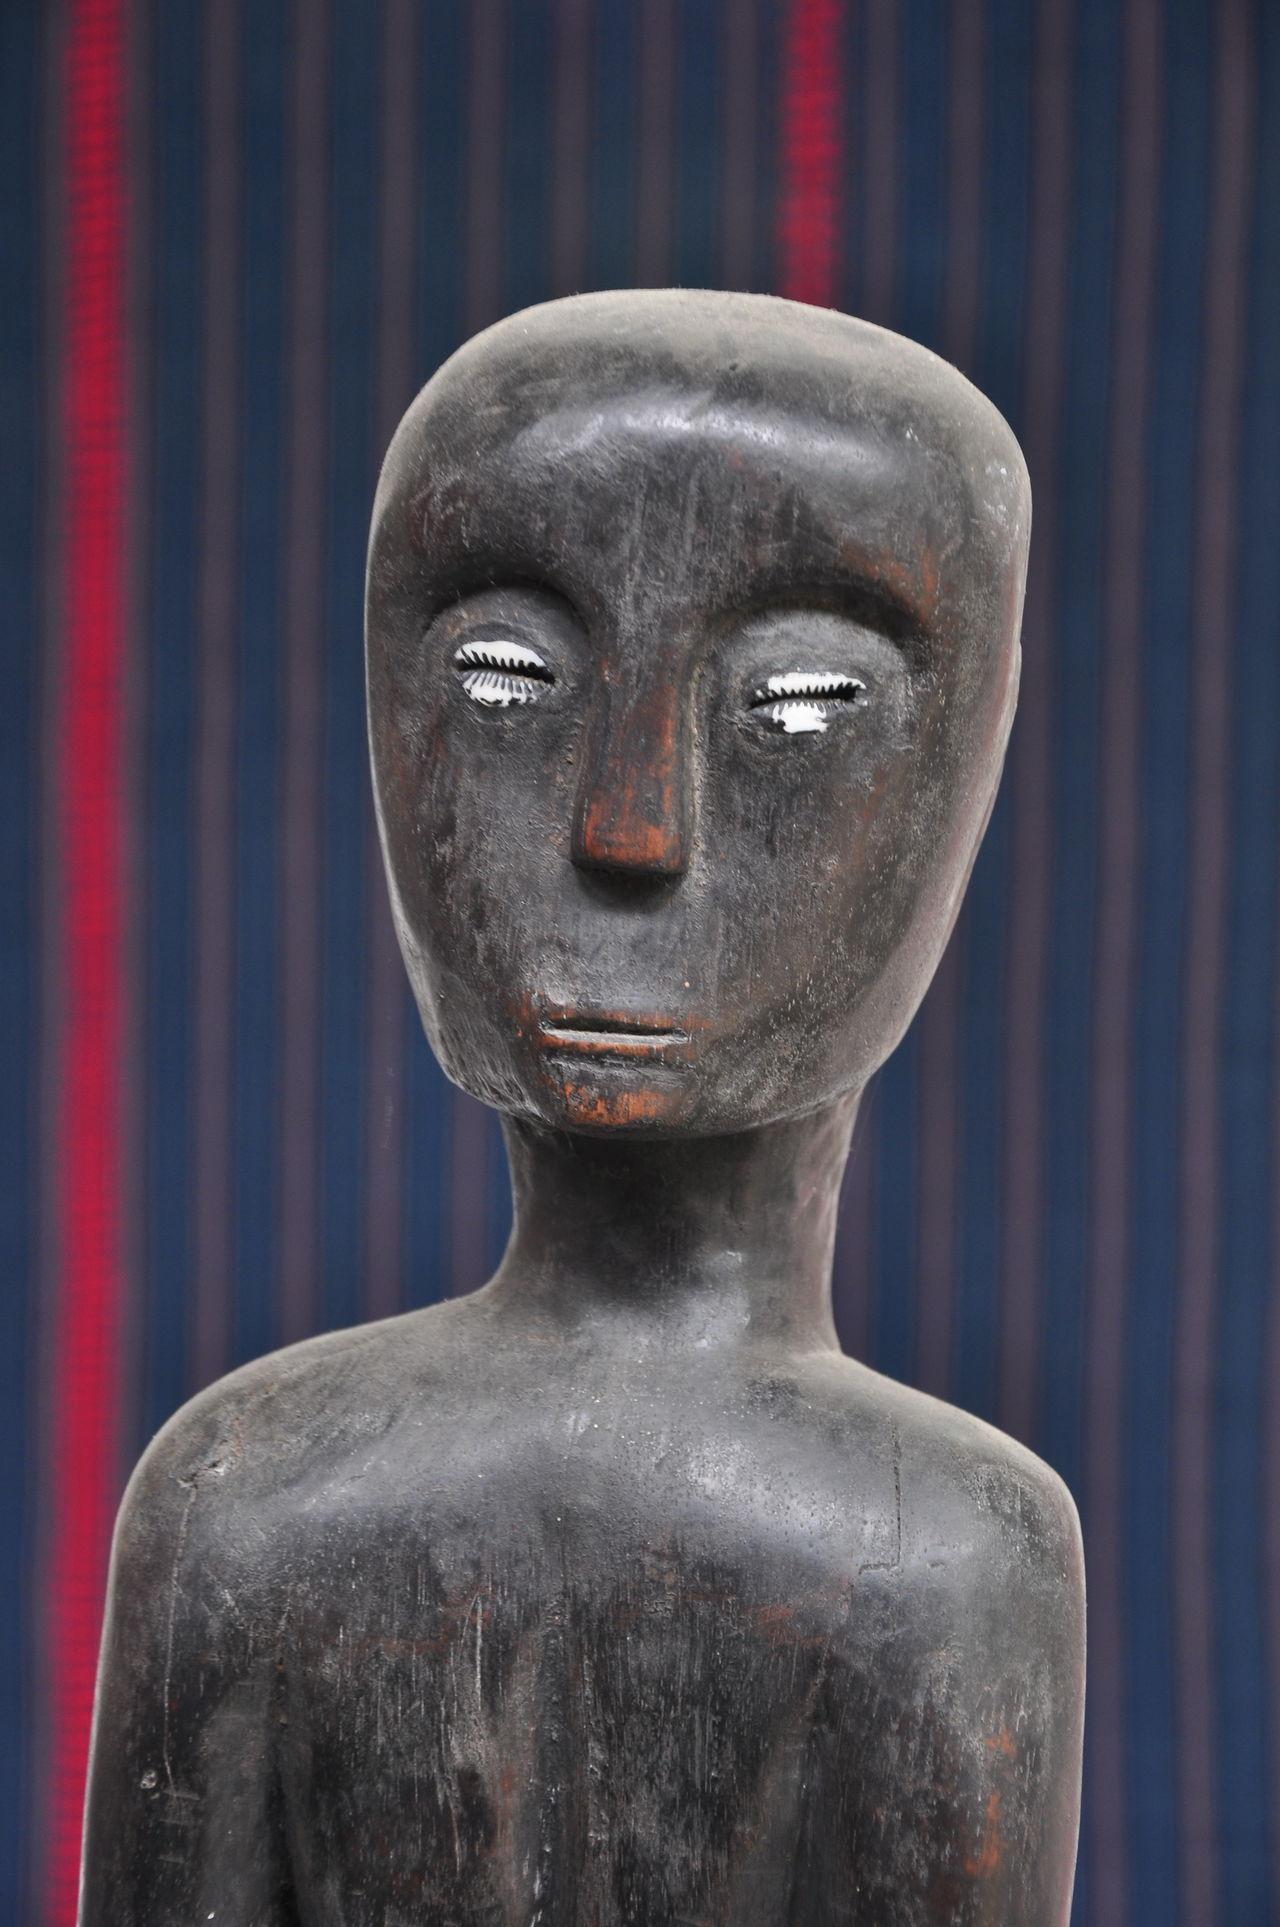 Pinto Art Museum #antipolo #antiques #art #artistic #ArtWork #museum #philippines #pintoartmuseum #rizalprovince #sculpture